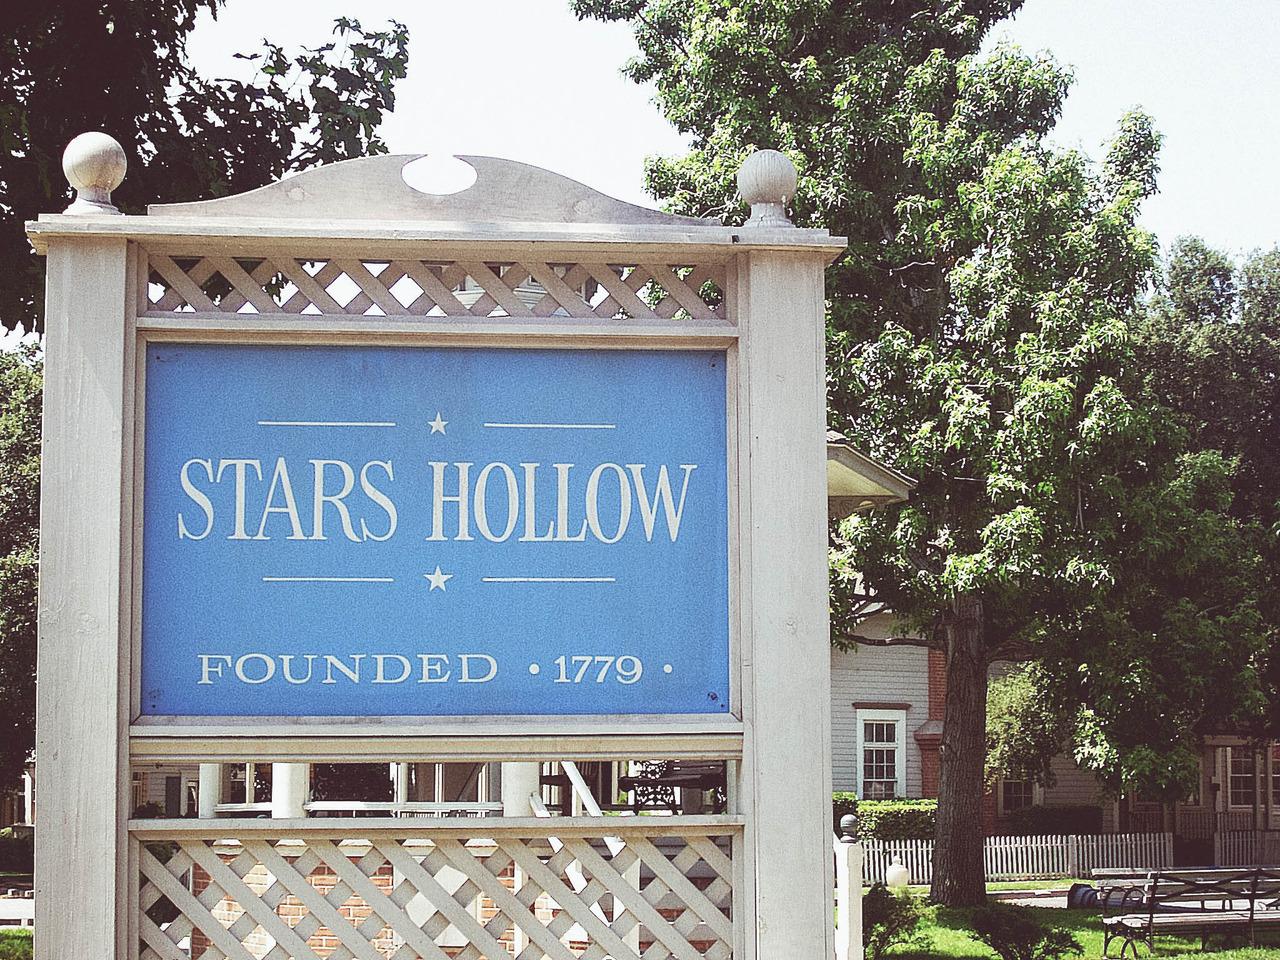 https://i2.wp.com/ndsuspectrum.com/wp-content/uploads/2016/10/Stars-Hollow_Sierra-Shupe.jpg